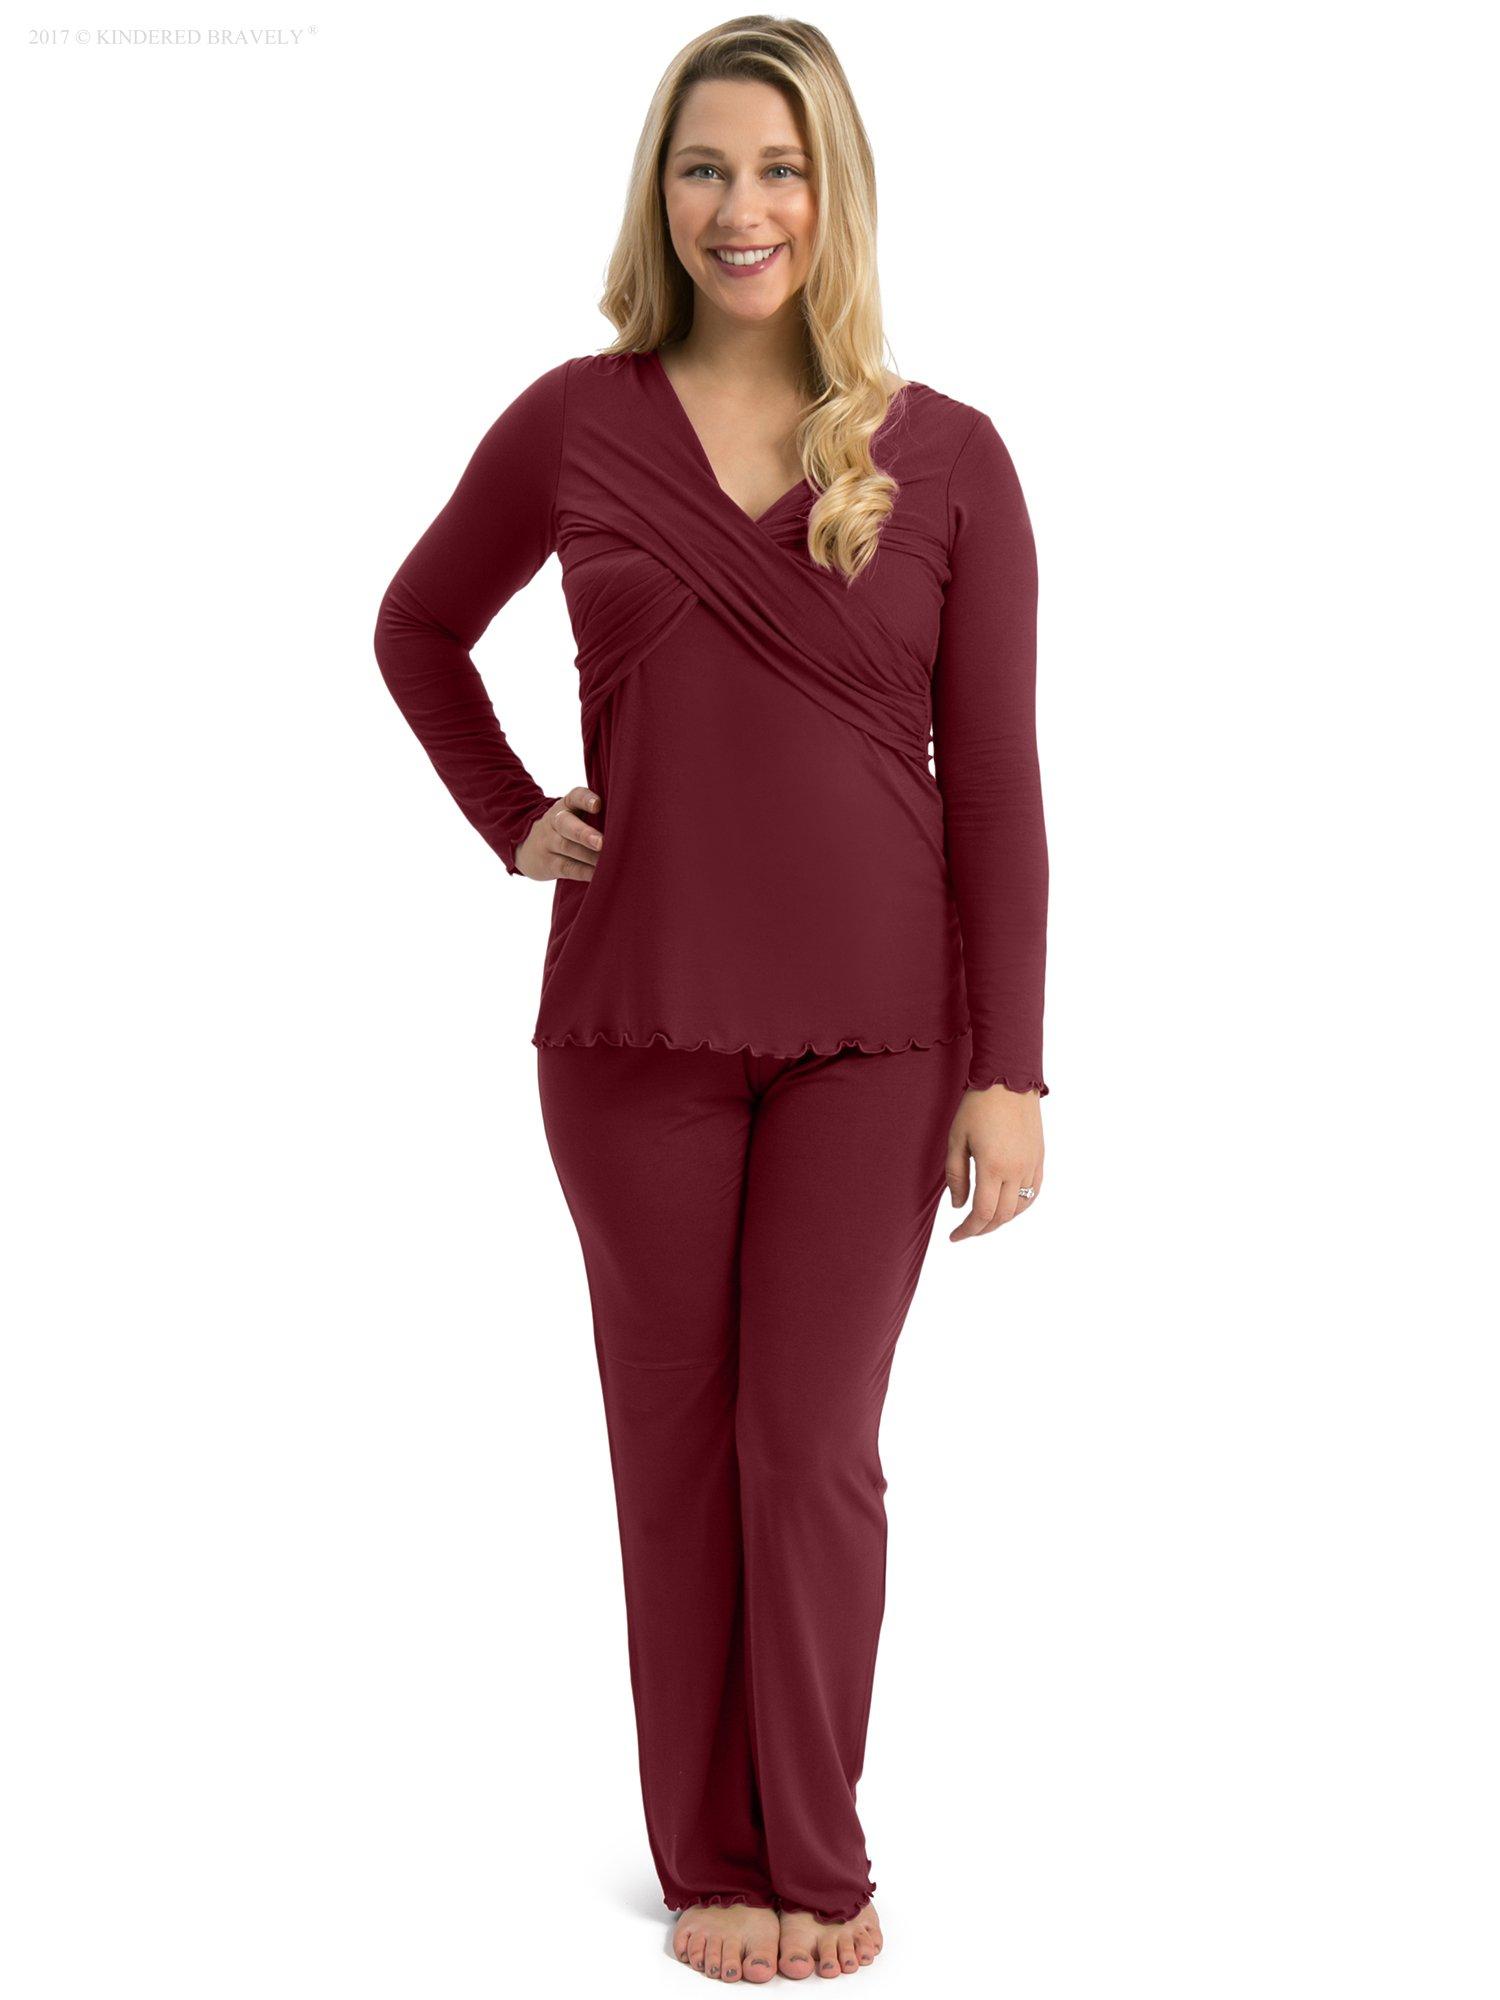 b6e23212d4cfd The Davy Long Sleeve Nursing & Maternity Pajamas (Pant Set ...